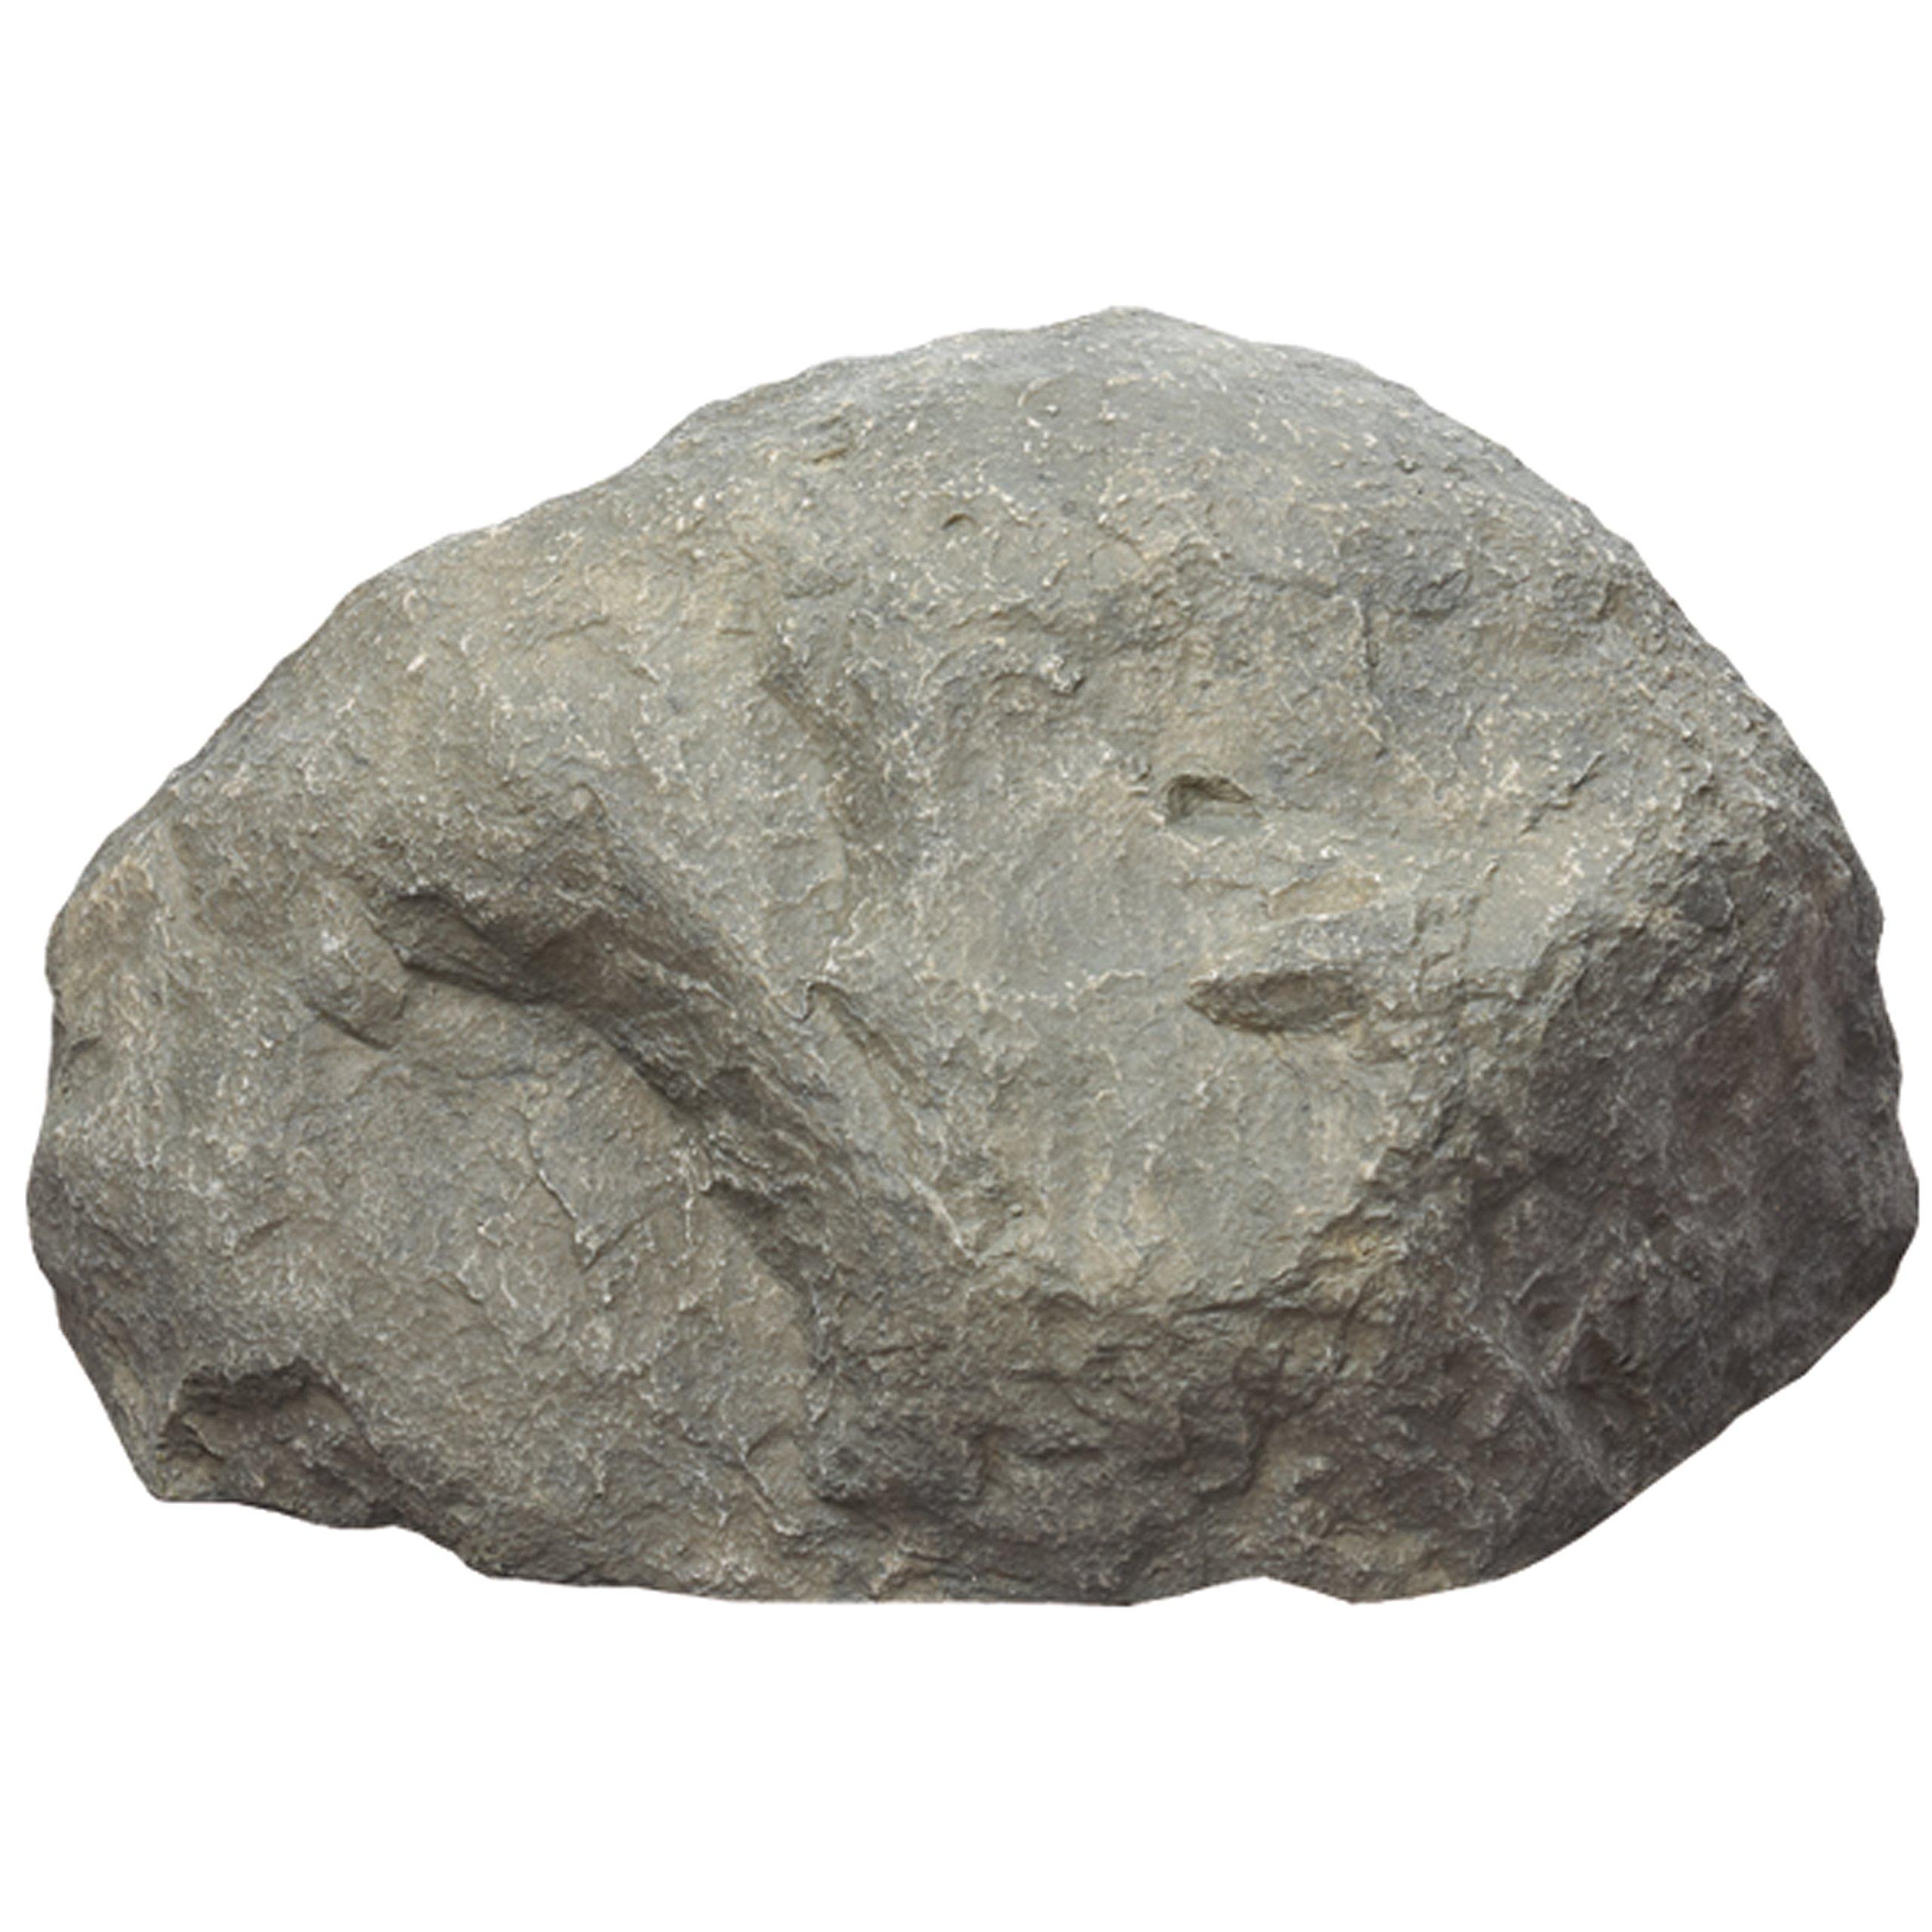 Outdoor Essentials Medium Faux Rock, Gray